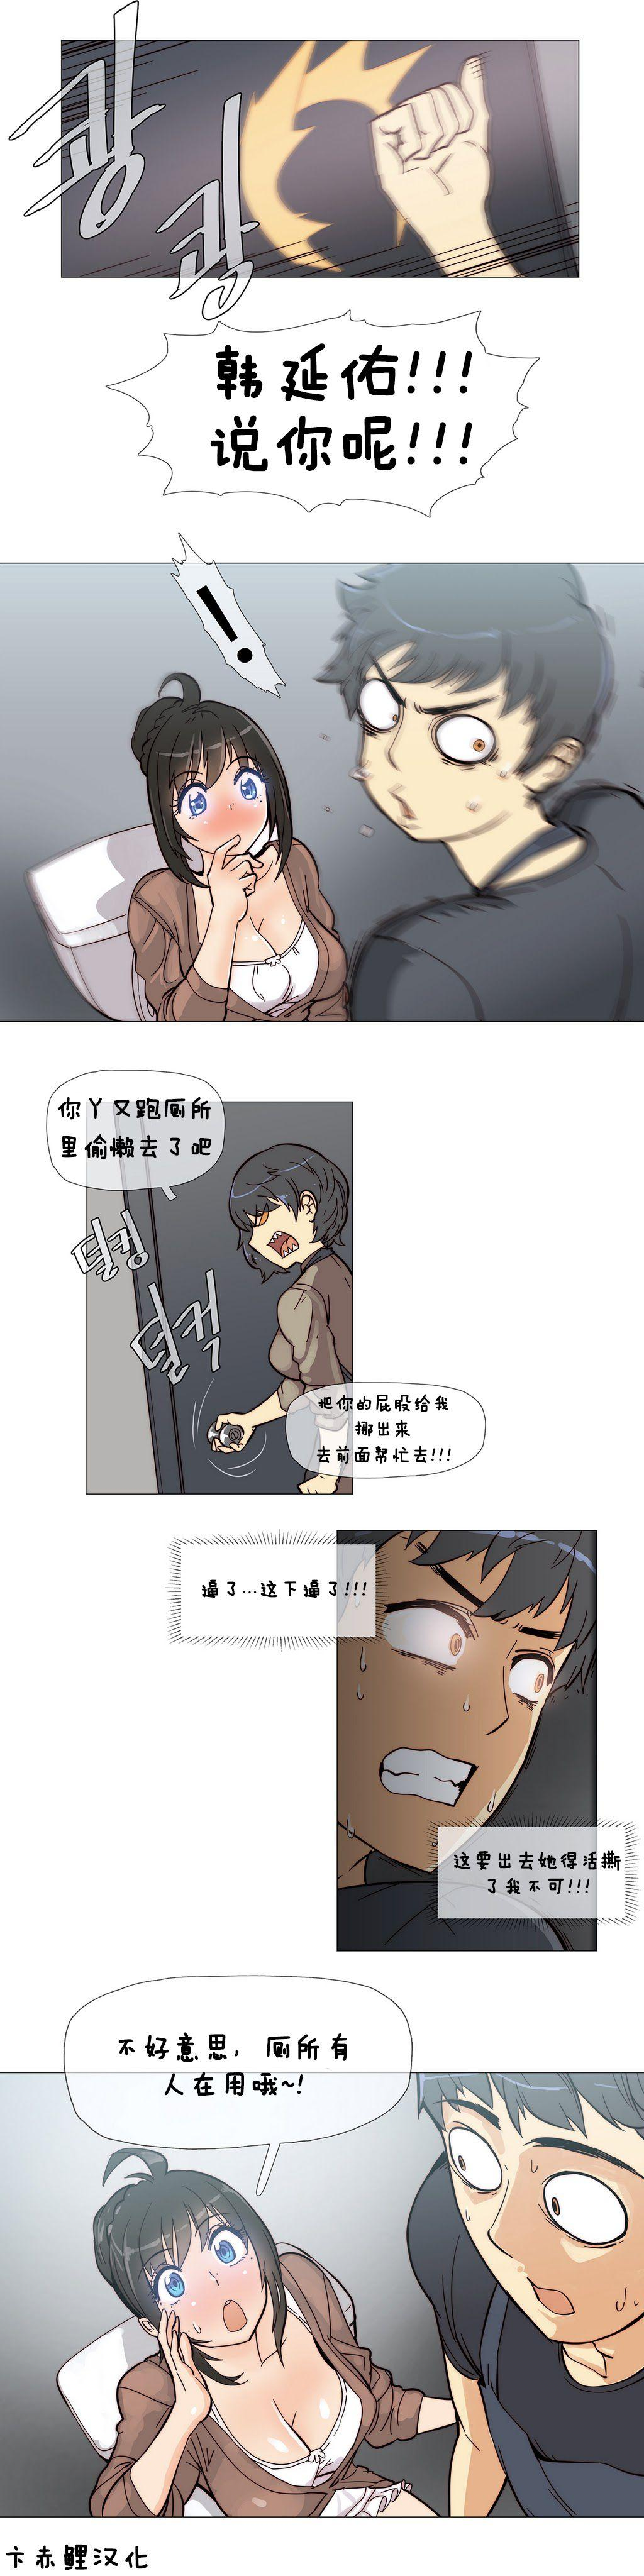 HouseHold Affairs 【卞赤鲤汉化】1~15话 75